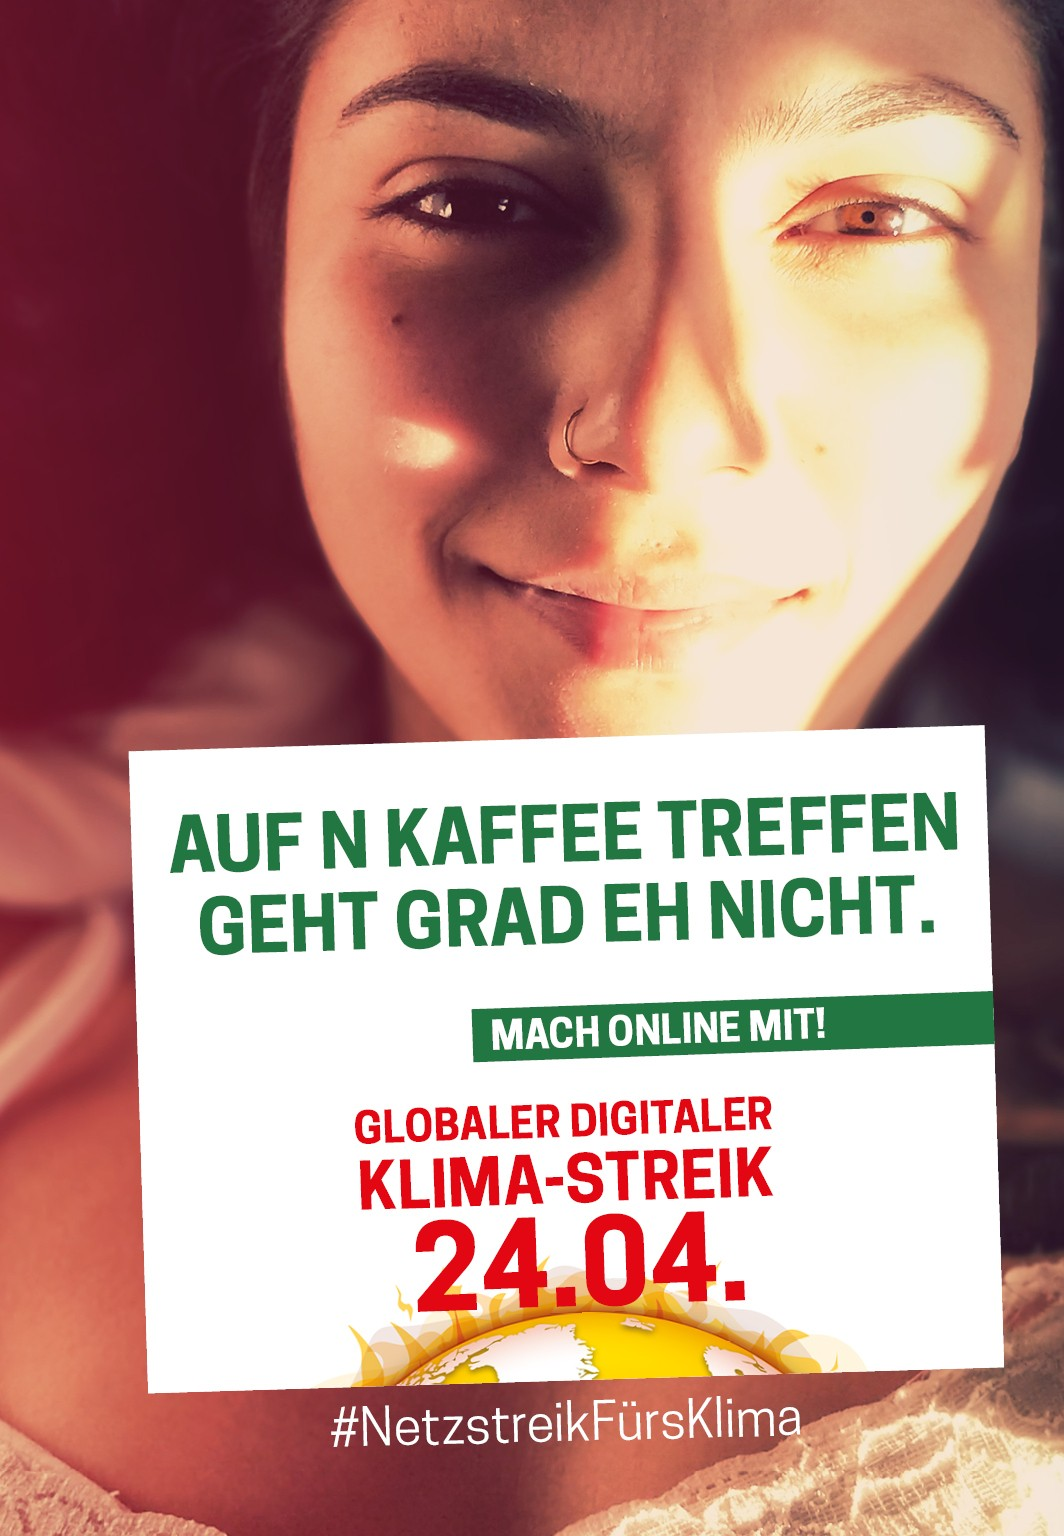 www. klima-streik.org - 24.04 campaign - tinder ad